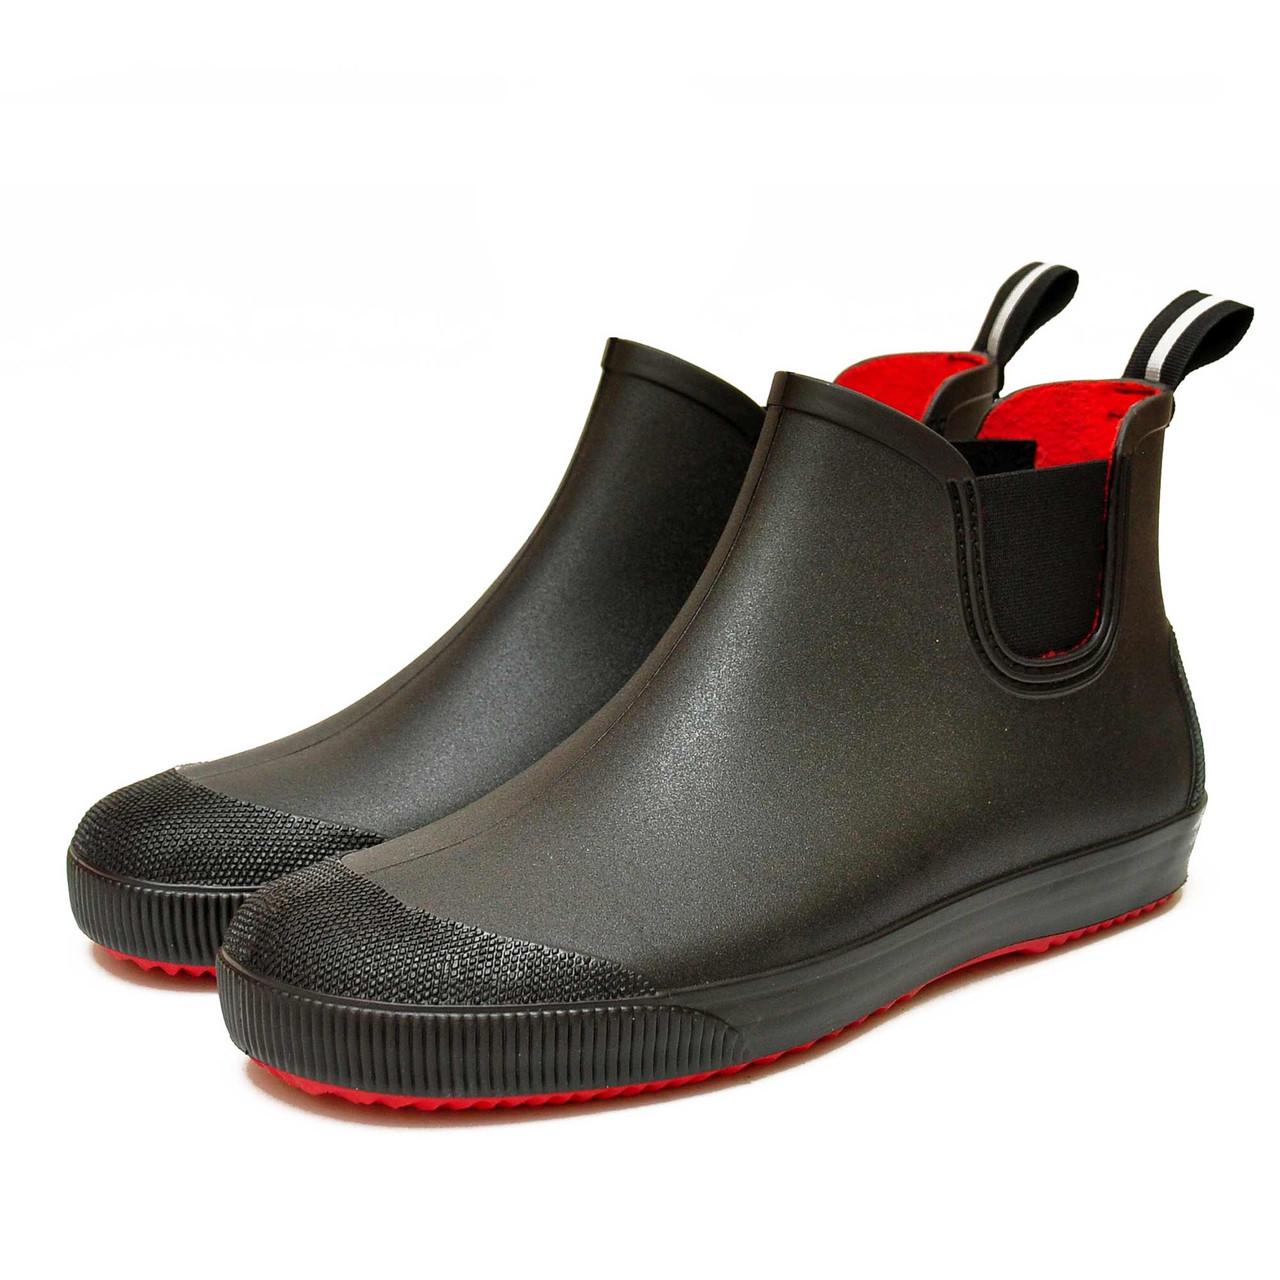 Ботинки мужские Nordman Beat ПC-30 размер 44